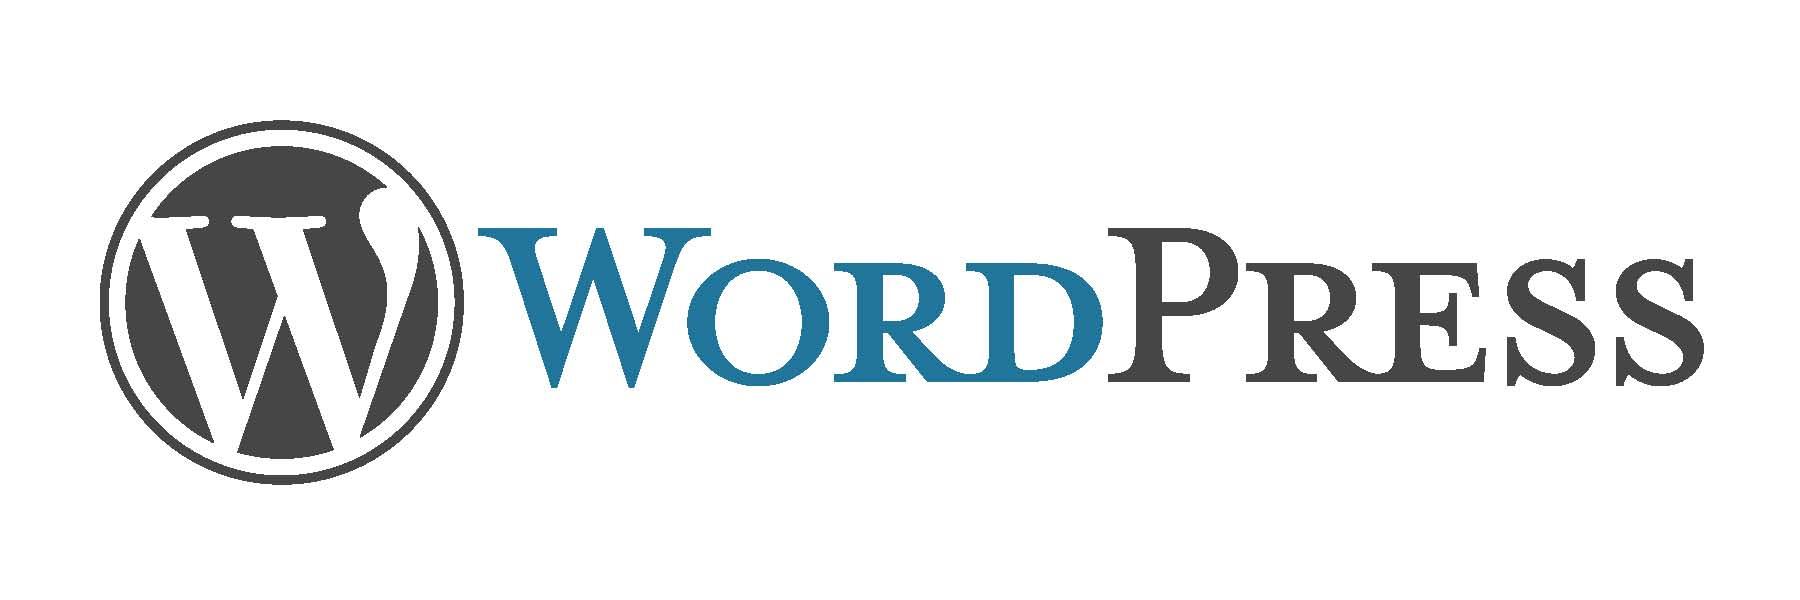 WordPress 3.5 Beta 2